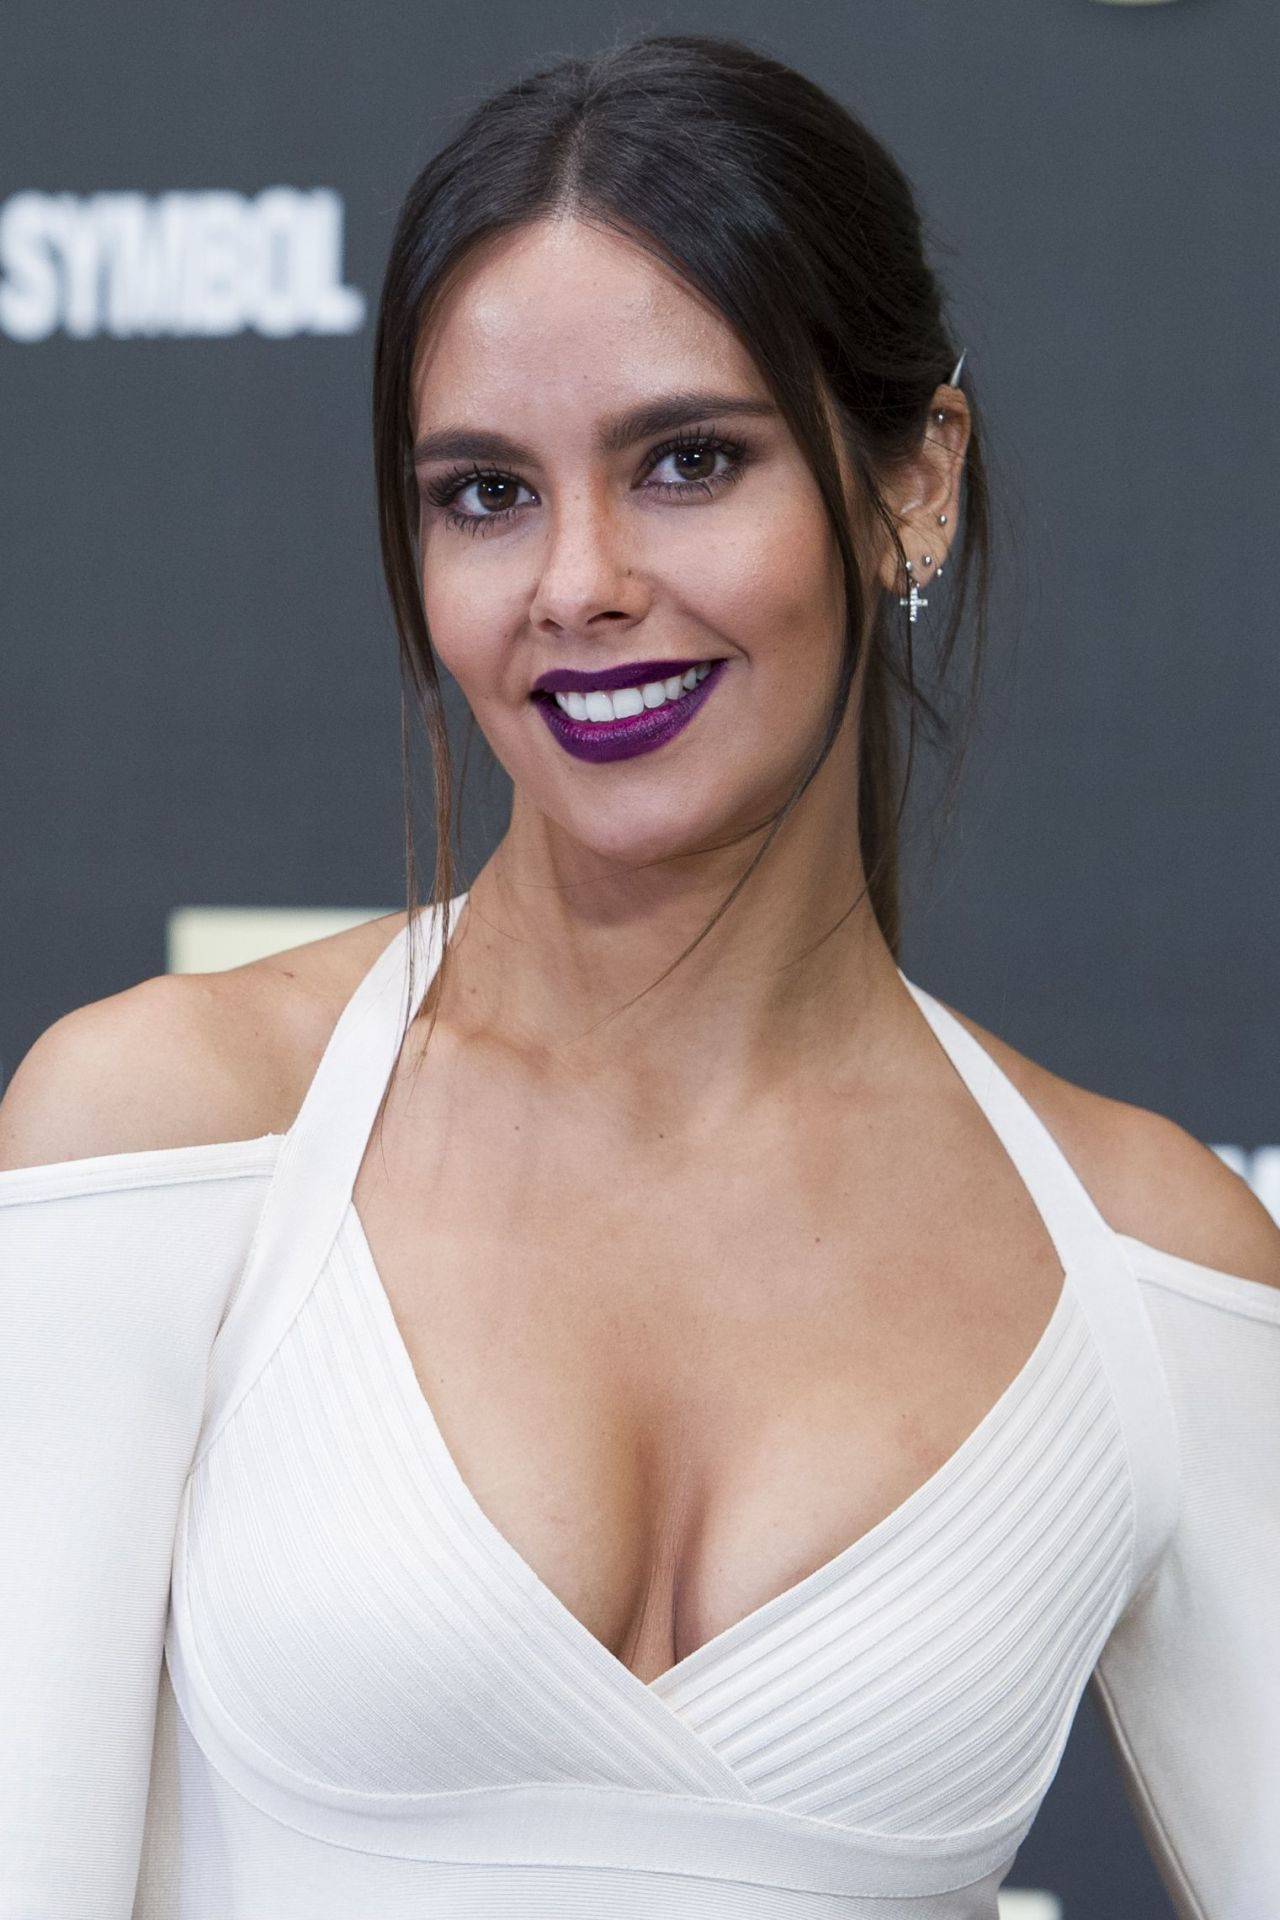 Fallece la actriz Cristina Pedroche